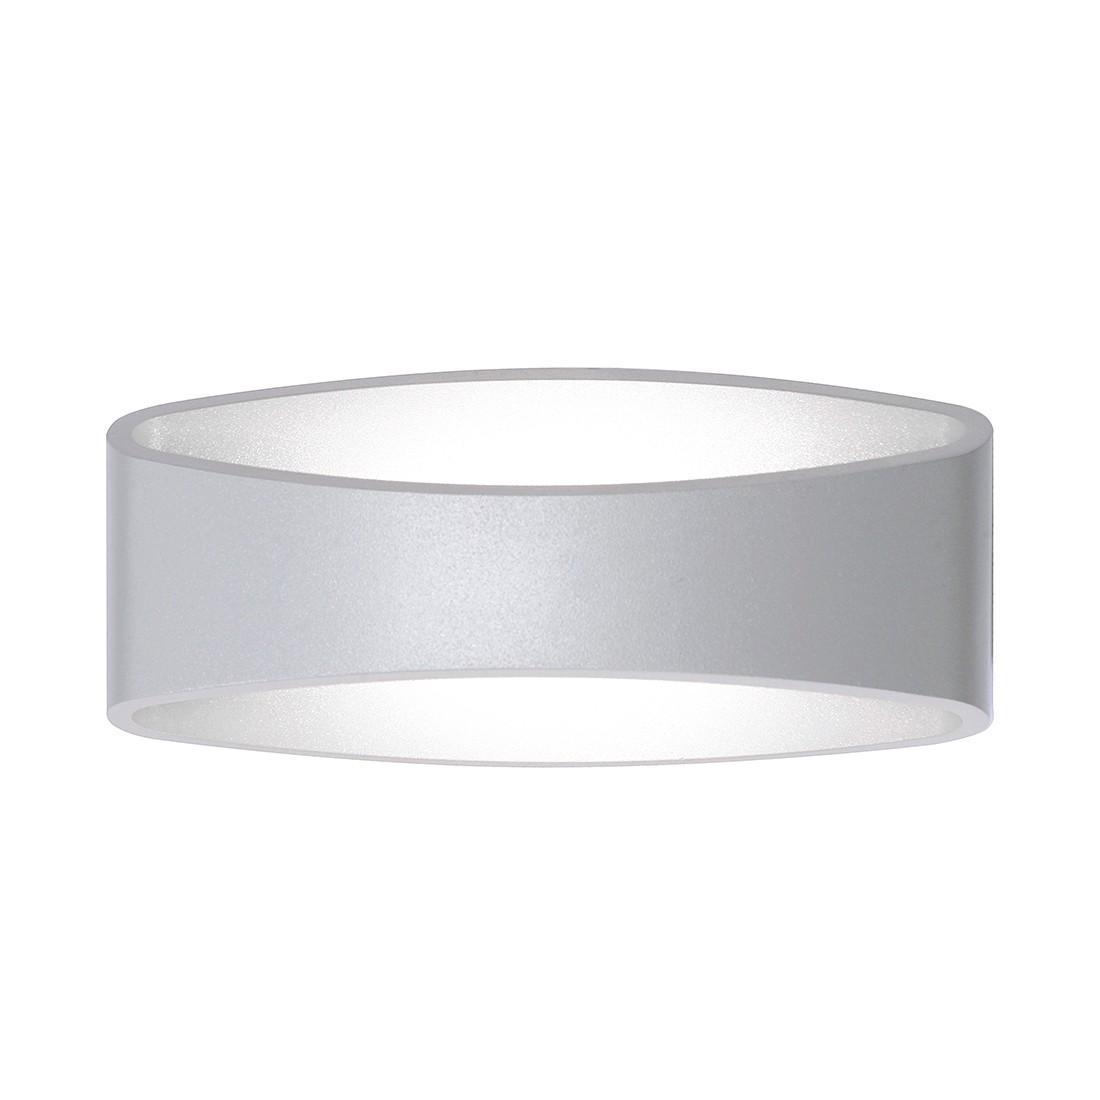 LED-Wandleuchte Holldorf ● Aluminium ● Grau- FLI Leuchten A+